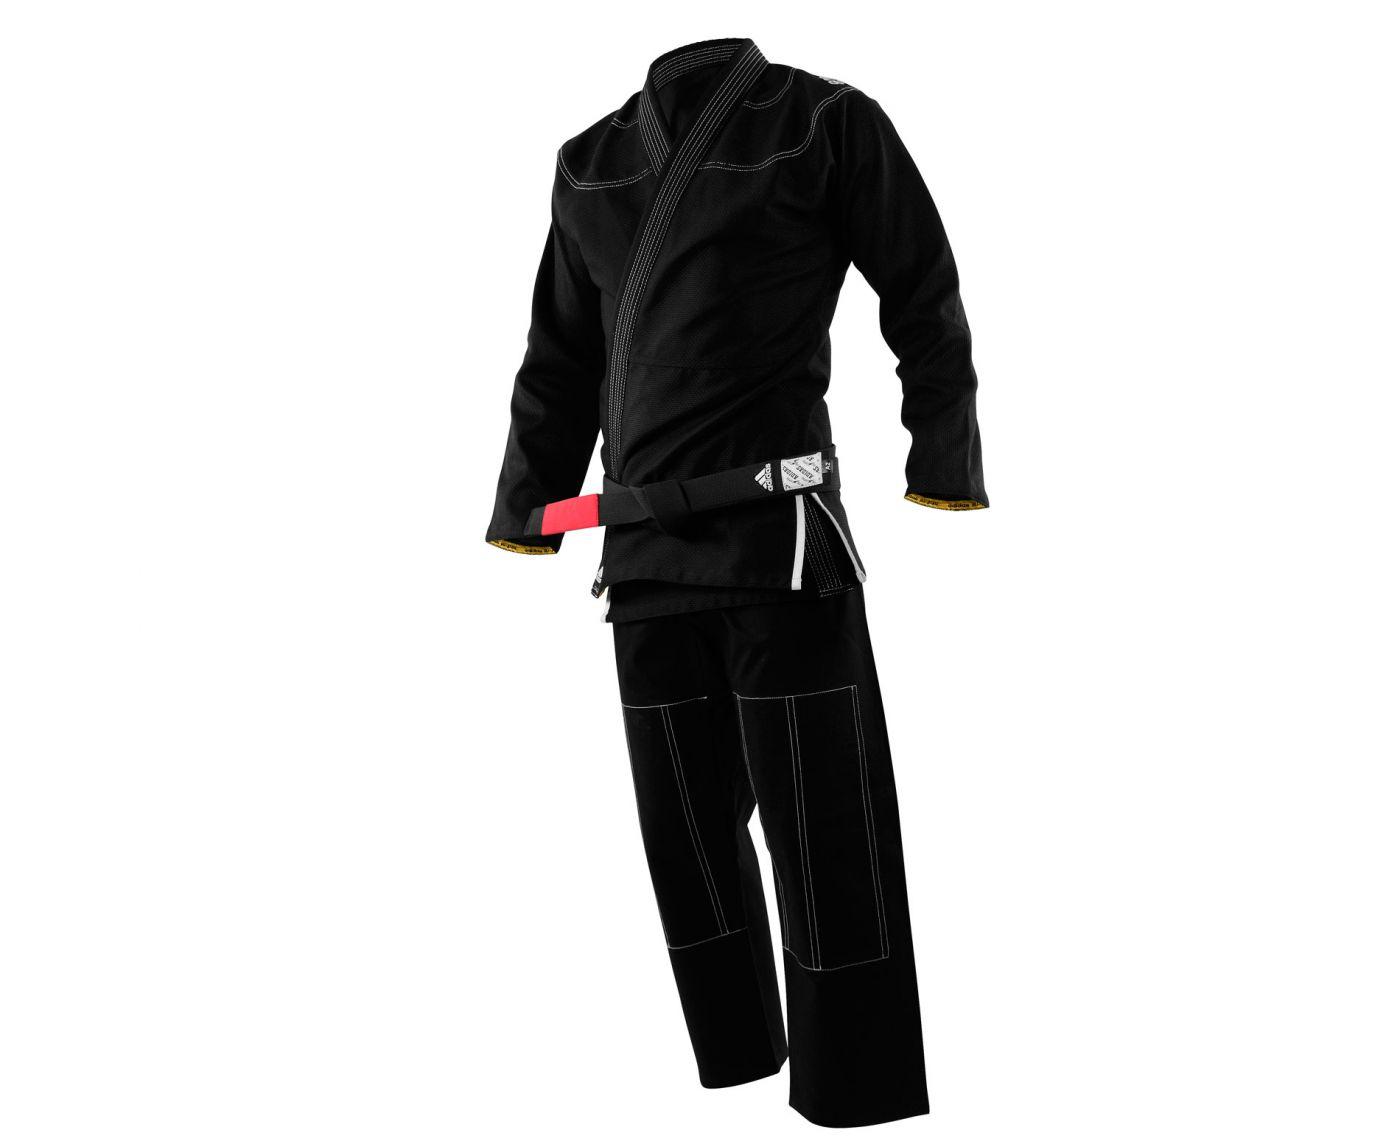 Кимоно для джиу-джитсу Challenge 2.0 чёрное, размер А1, артикул JJ350В